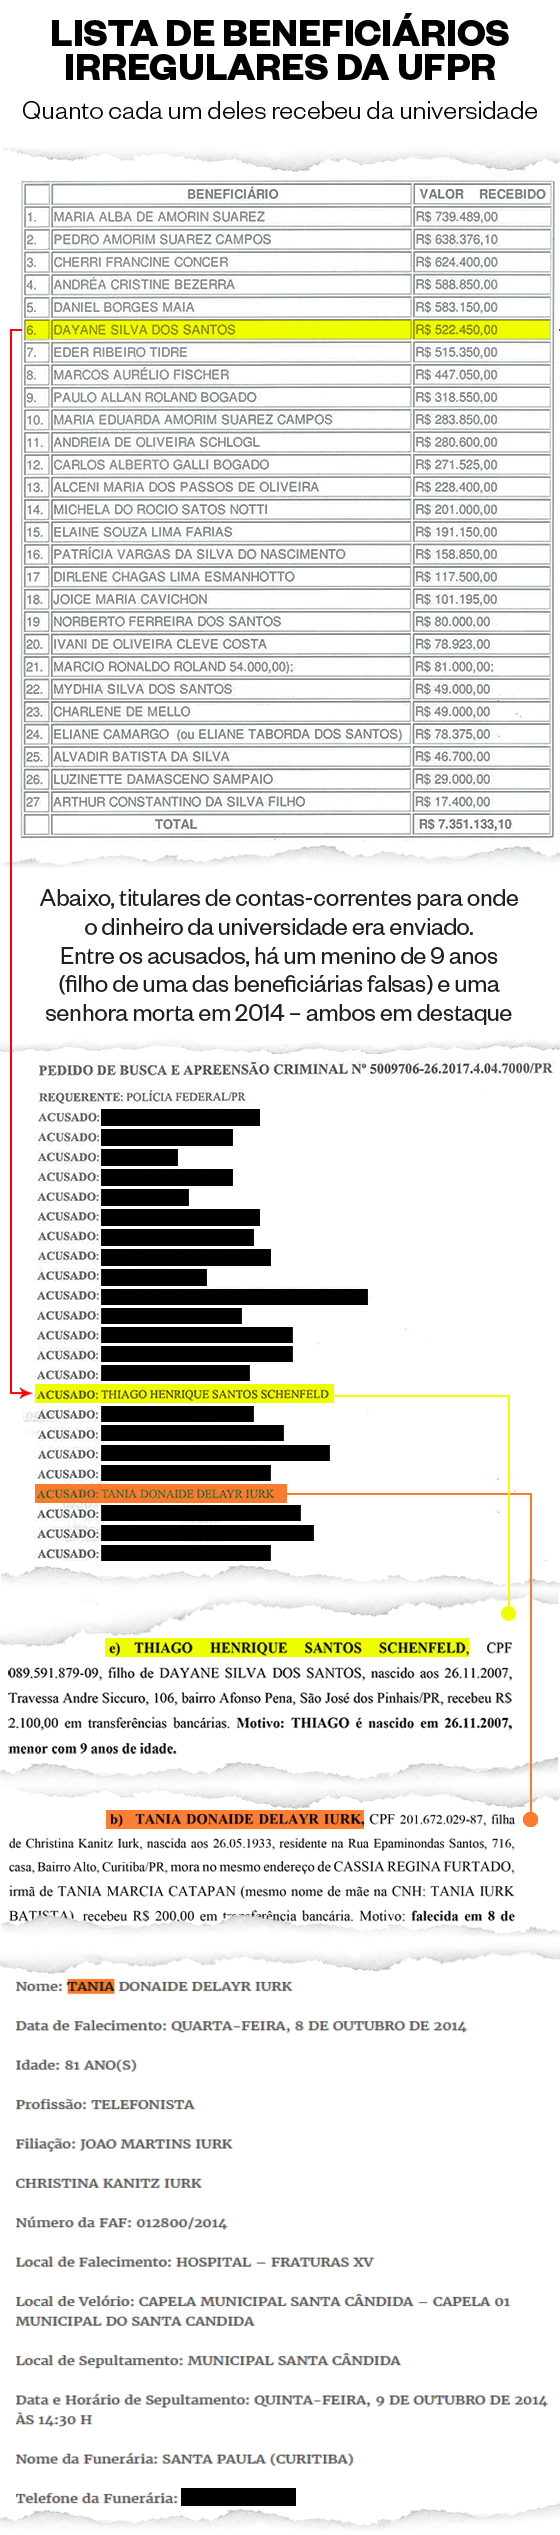 Lista de beneficiários irregulares da UFPR. Nenhum deles possui currículo Lattes (Foto: Infografia ÉPOCA / Renato Tanigawa)